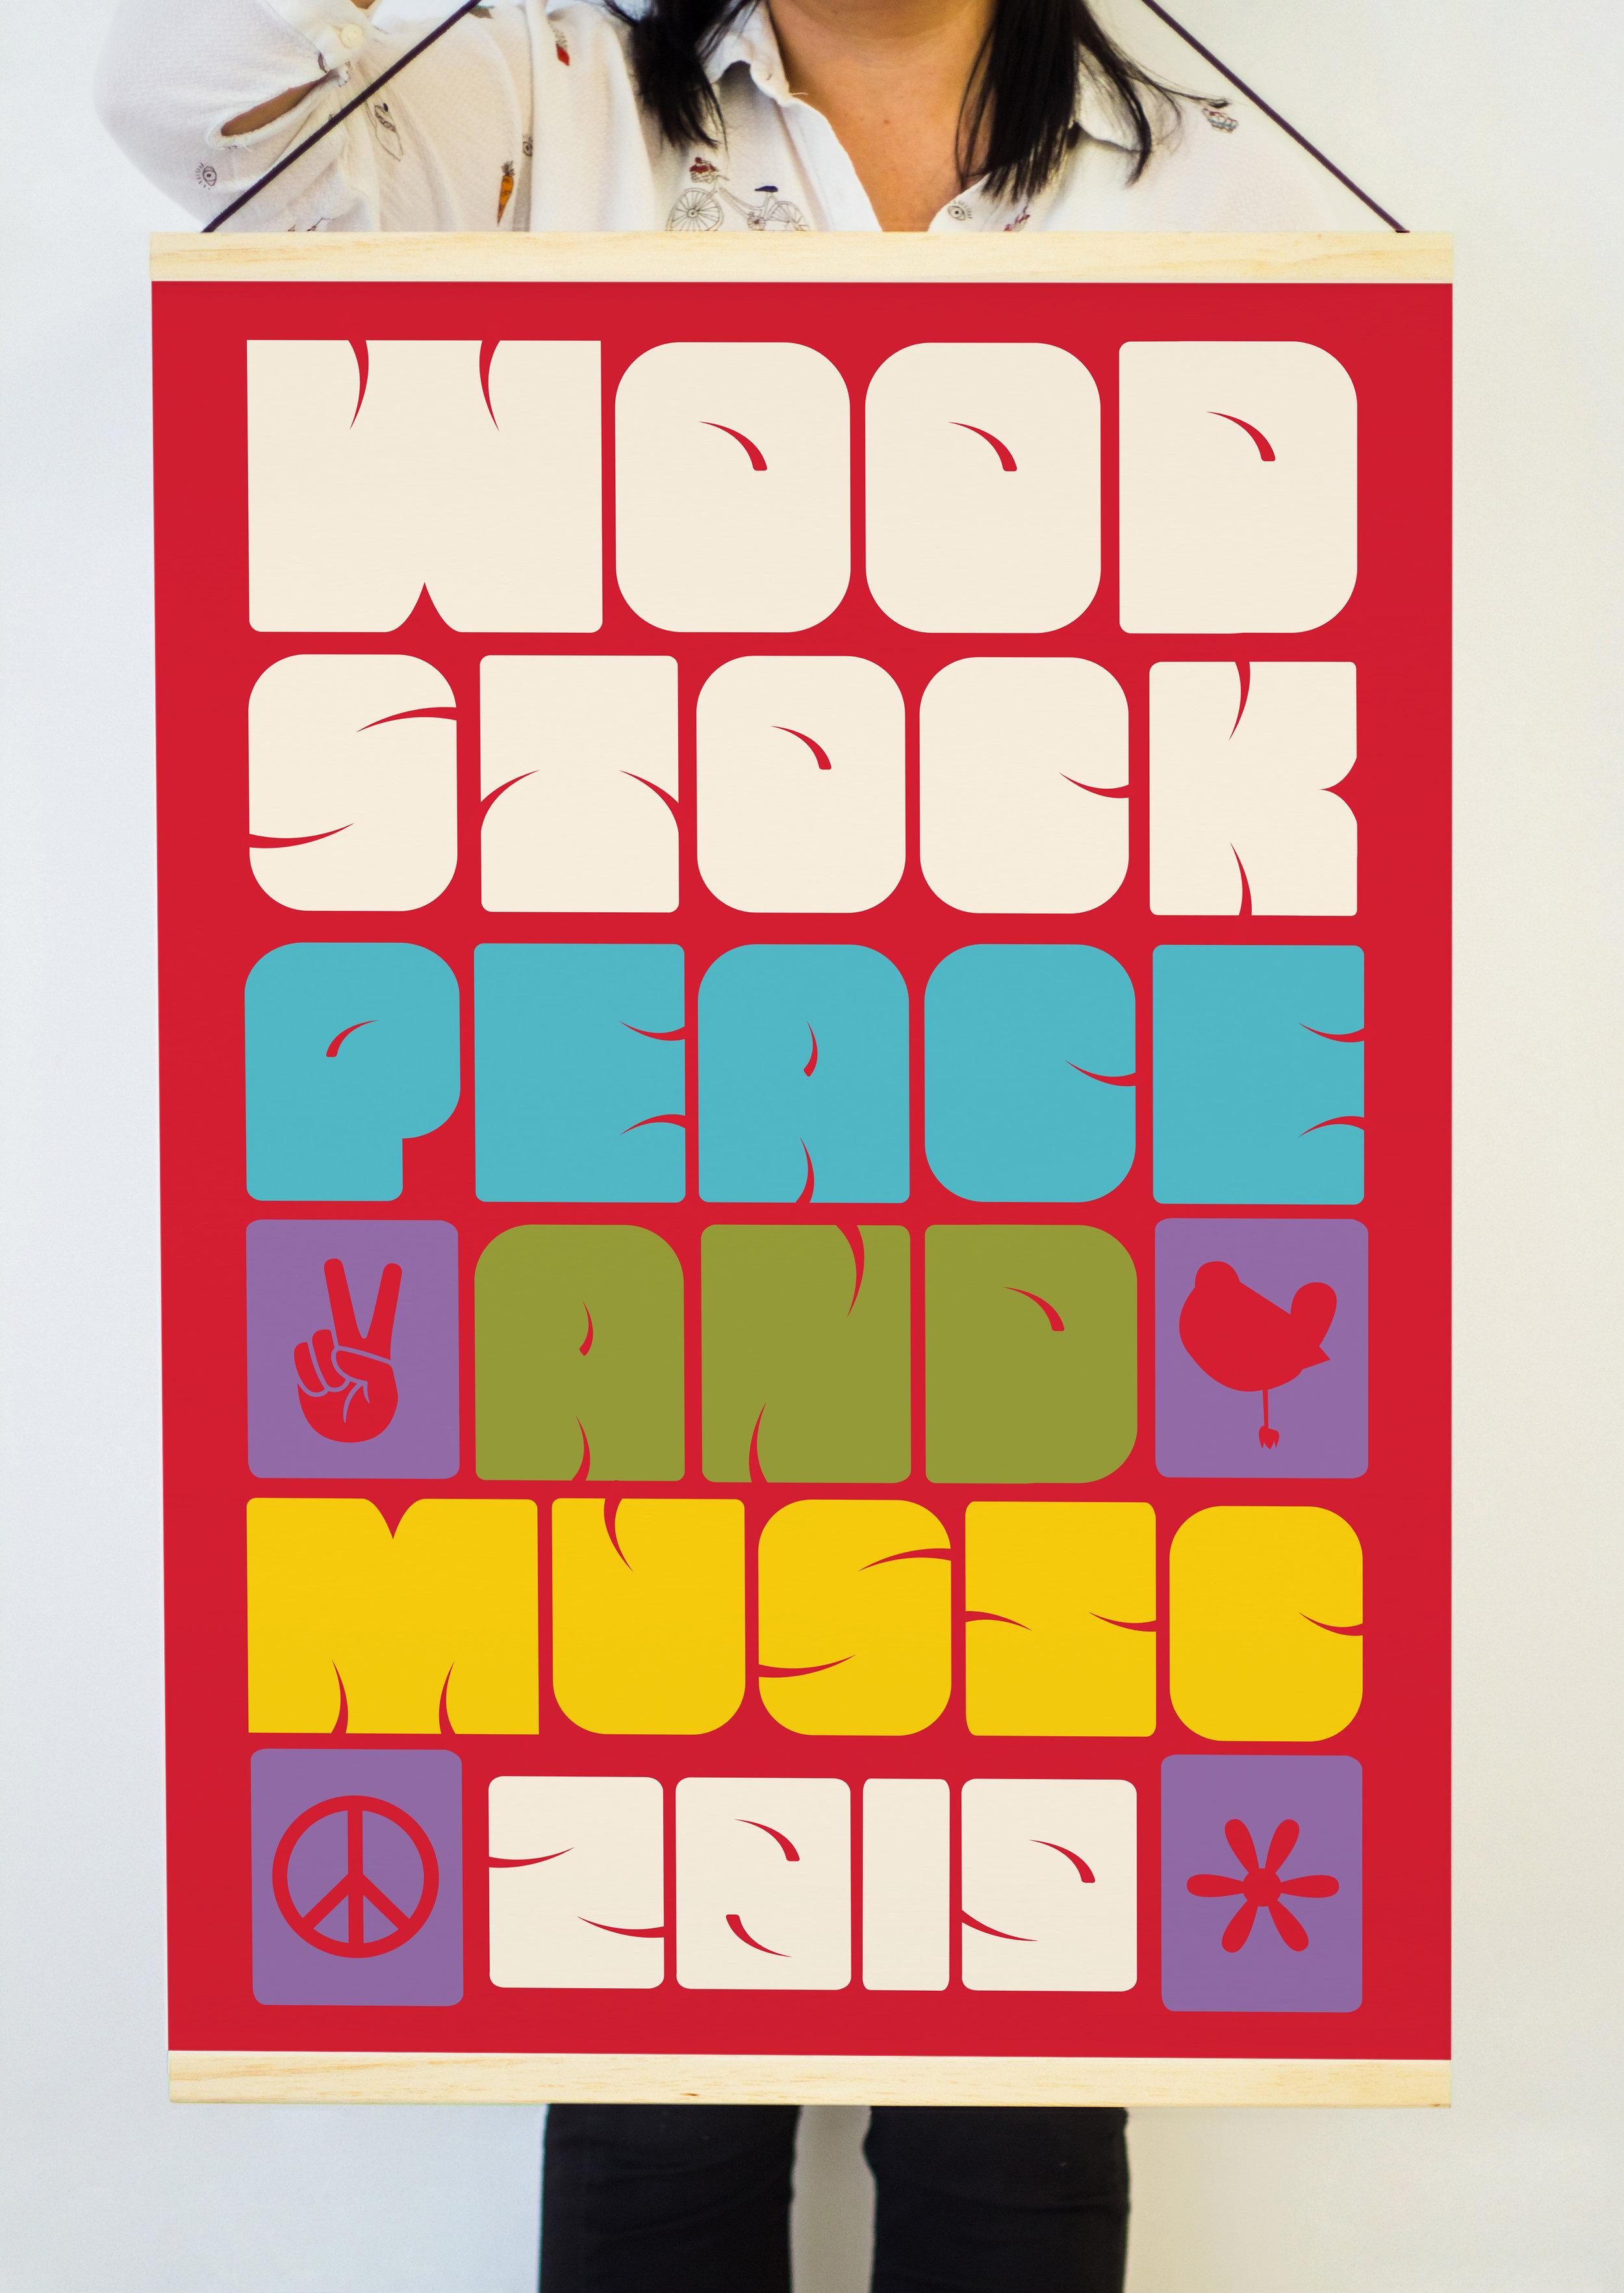 posterwoodstock3.jpg